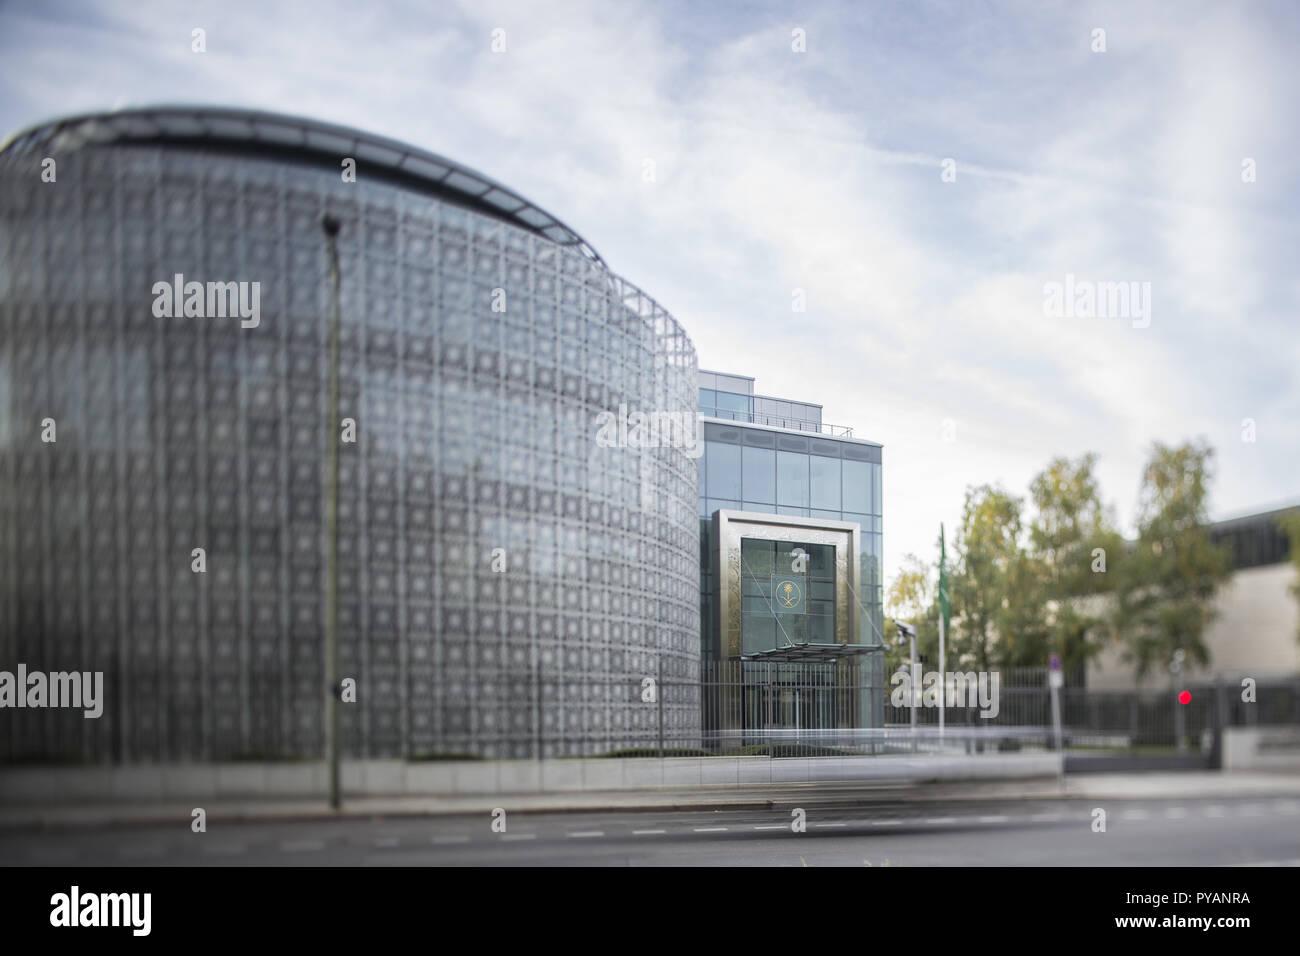 09.10.2018, Berlin: Blick auf die Botschaft des Königreichs Saudi-Arabien a Berlino.(Aufahme mit Tilt-Shift Objekiv) Foto: Wolfram Kastl/dpa | Utilizzo di tutto il mondo Immagini Stock